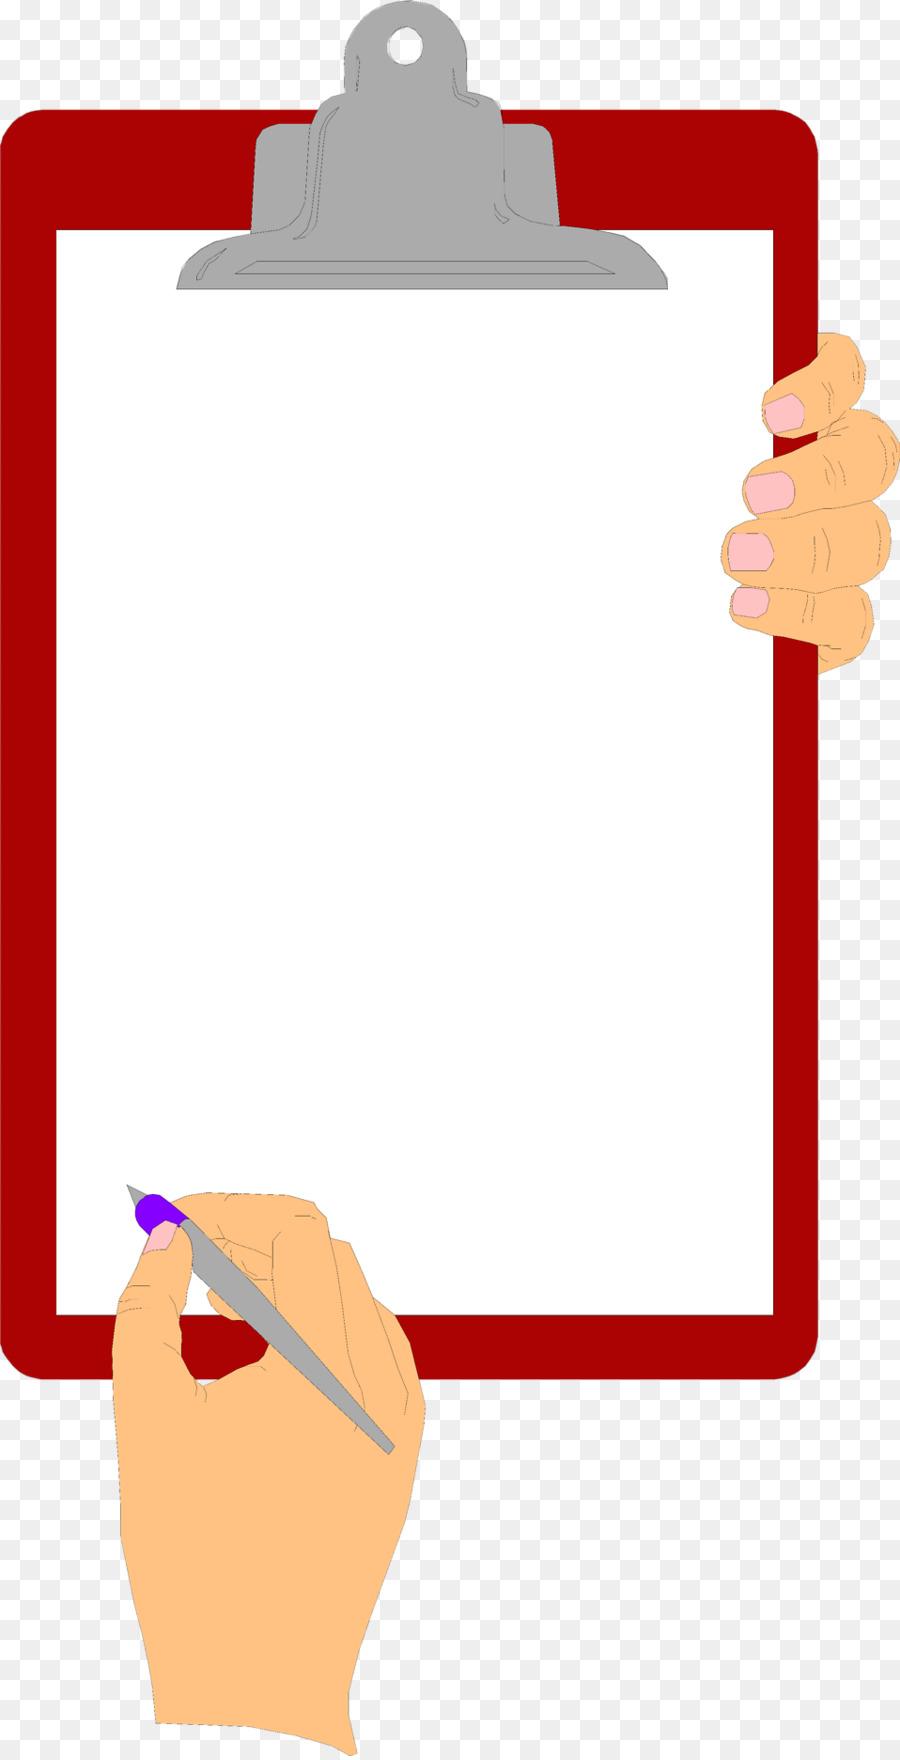 clipboard clip art clipboard png download 958 1869 free rh kisspng com clipboard clipart free clipboard clipart transparent